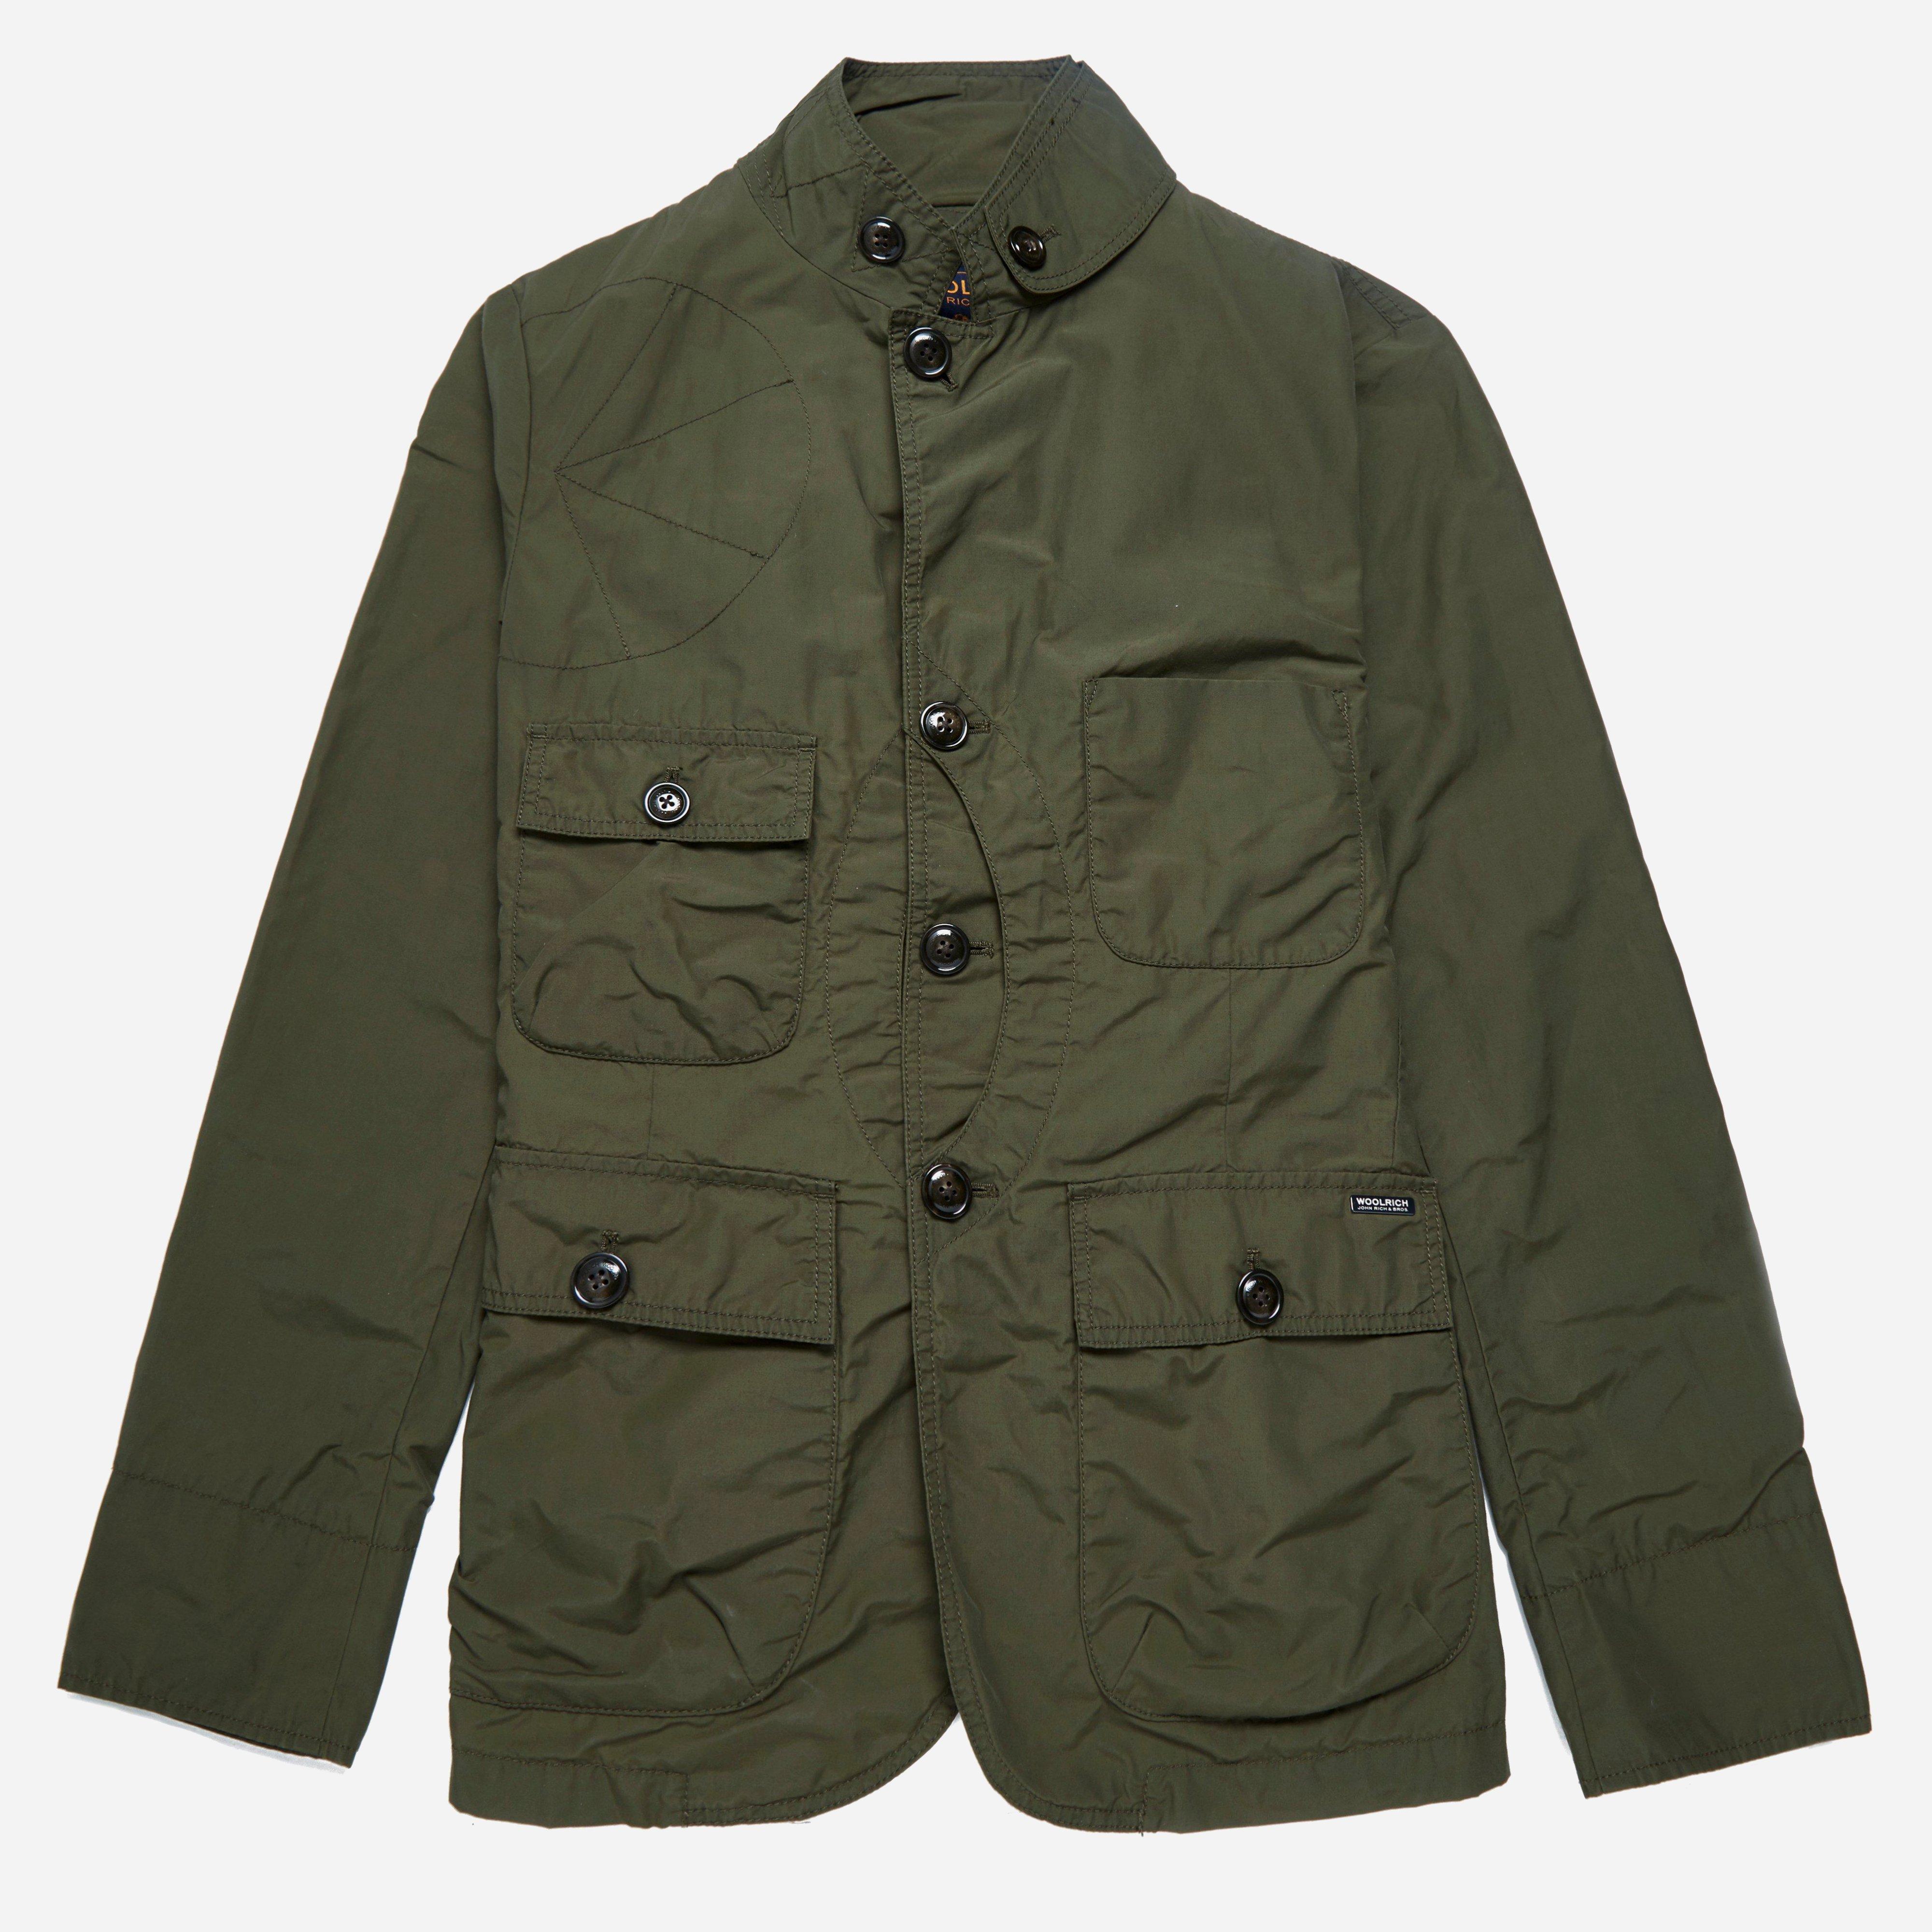 Woolrich Upland Jacket